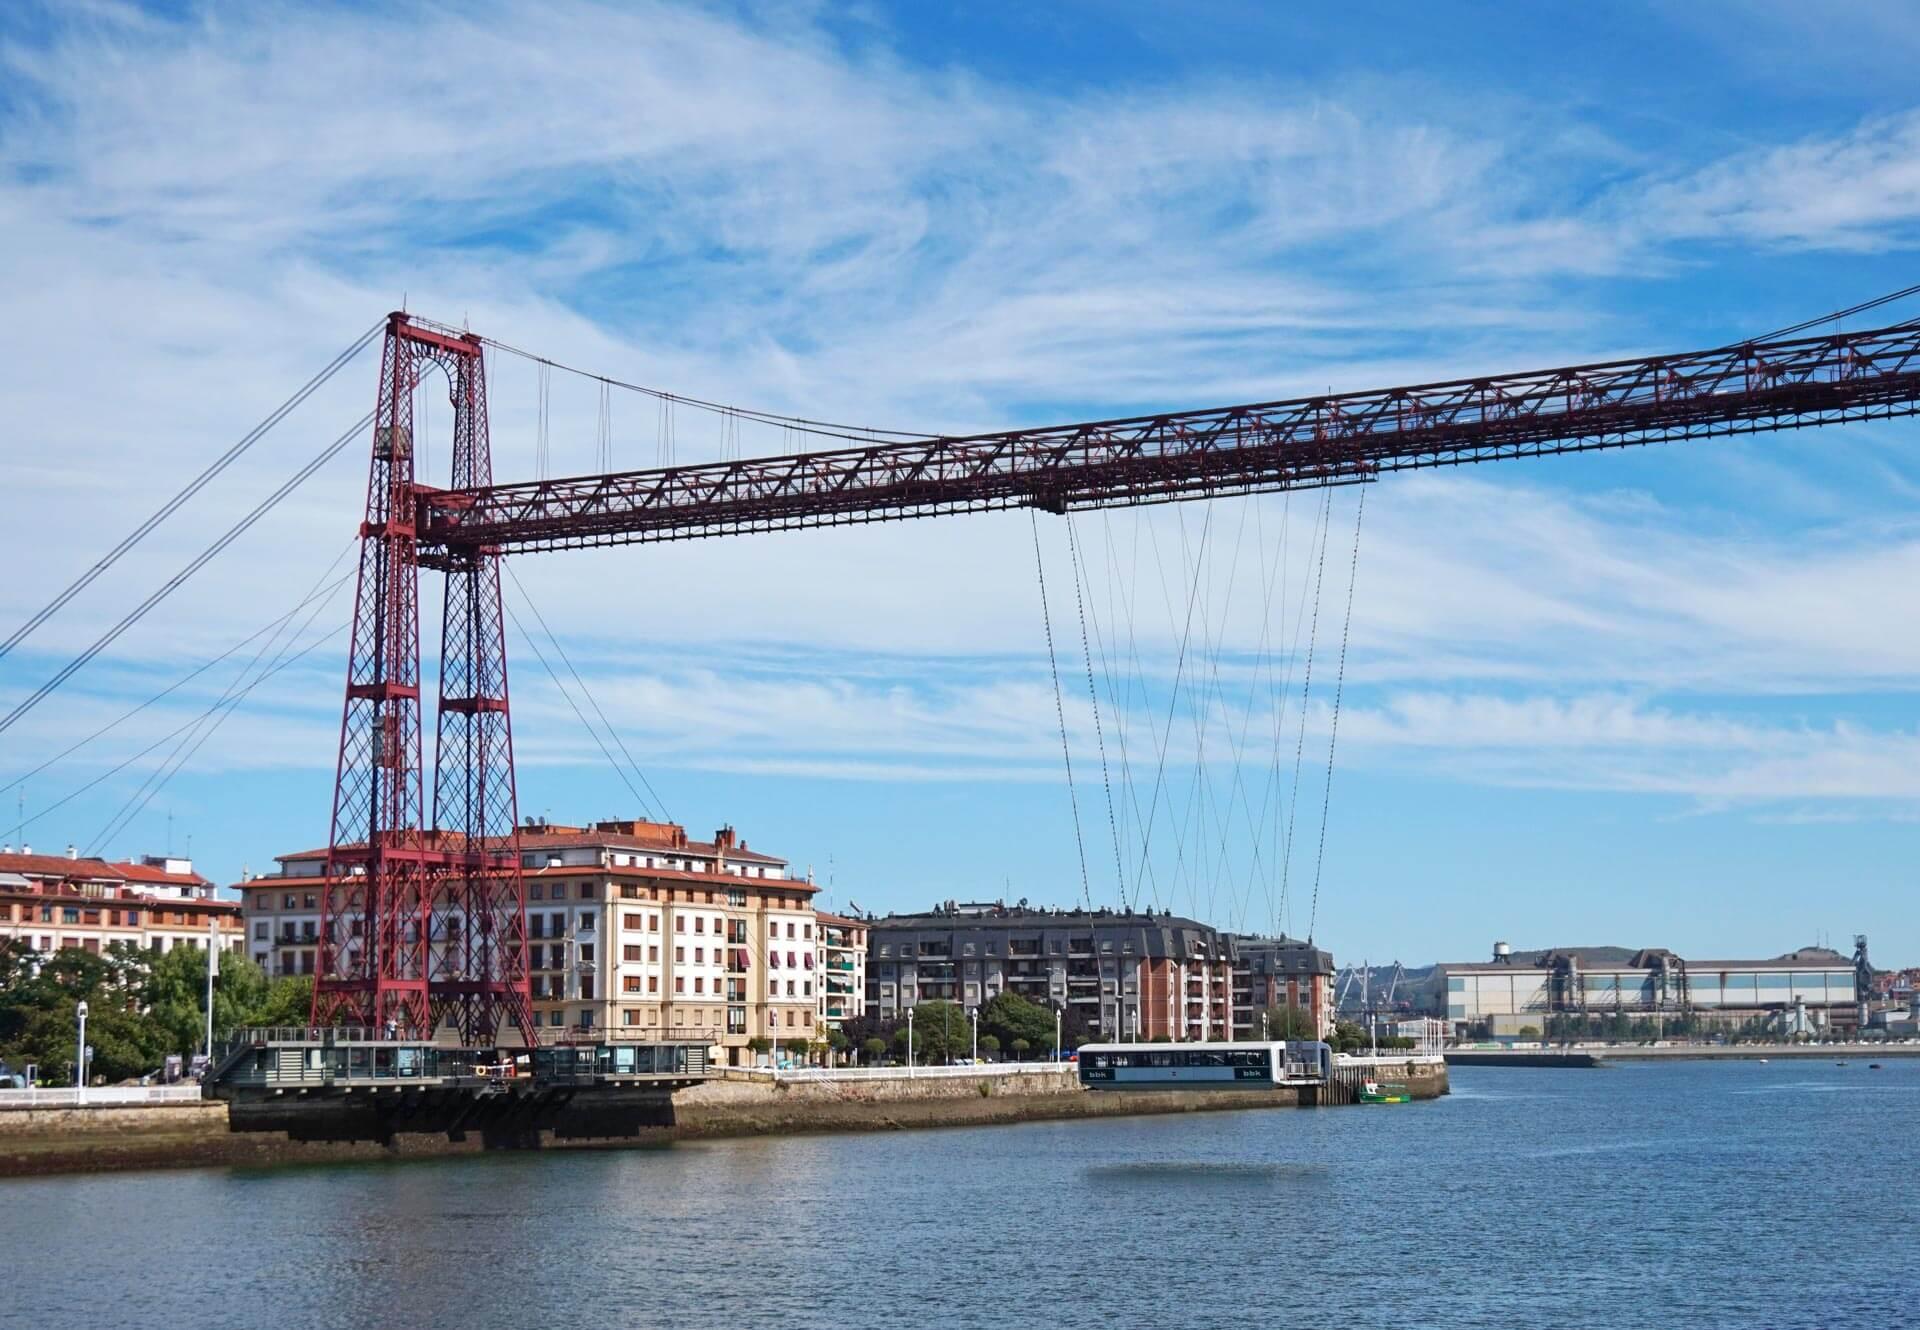 Puente Colgante Getxo Portugalete